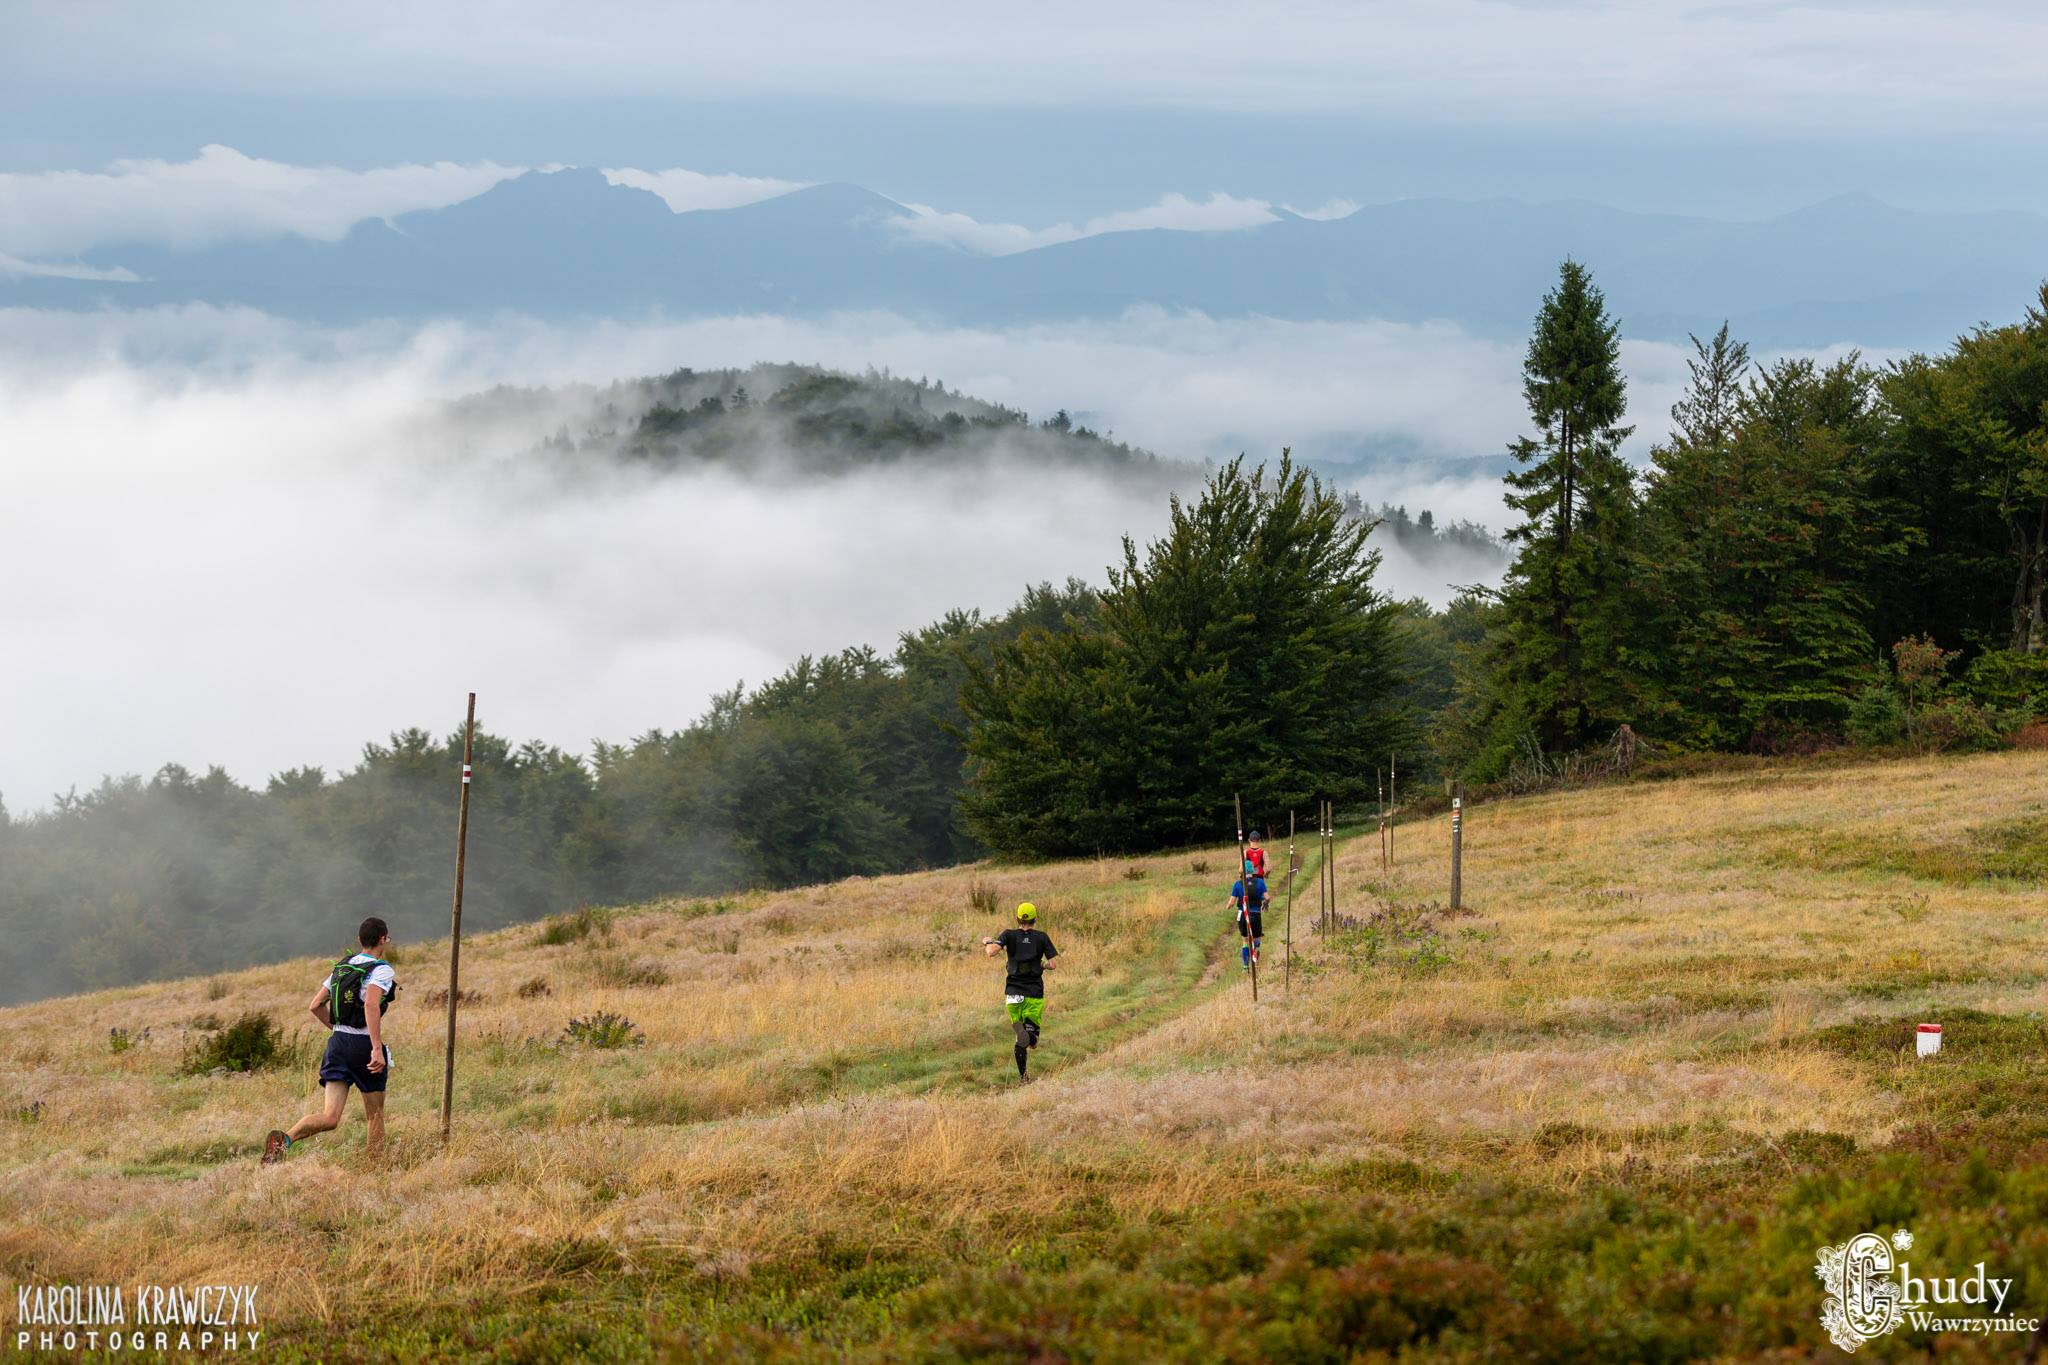 Górska polana, góry i chmury w tle, biegacze na polanie